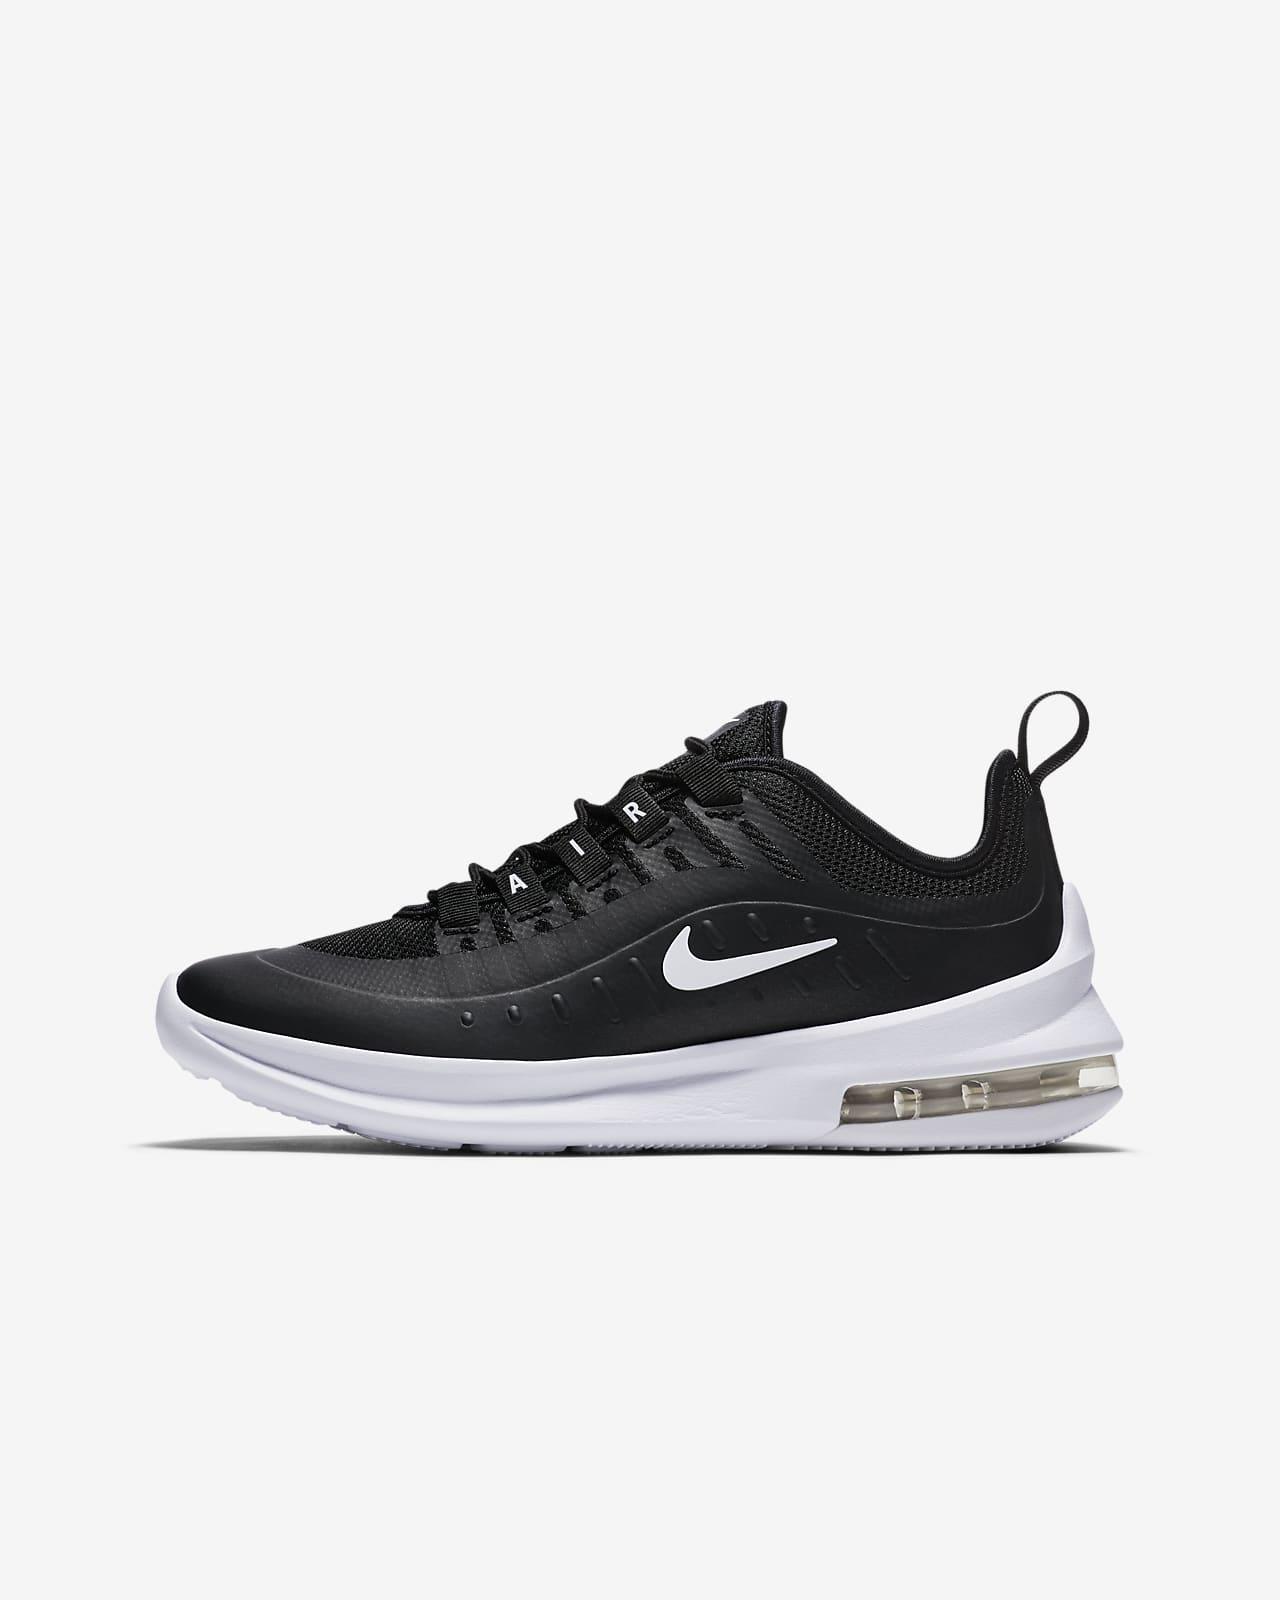 rosario Imbécil aniversario  Nike Air Max Axis Older Kids' Shoe. Nike AU